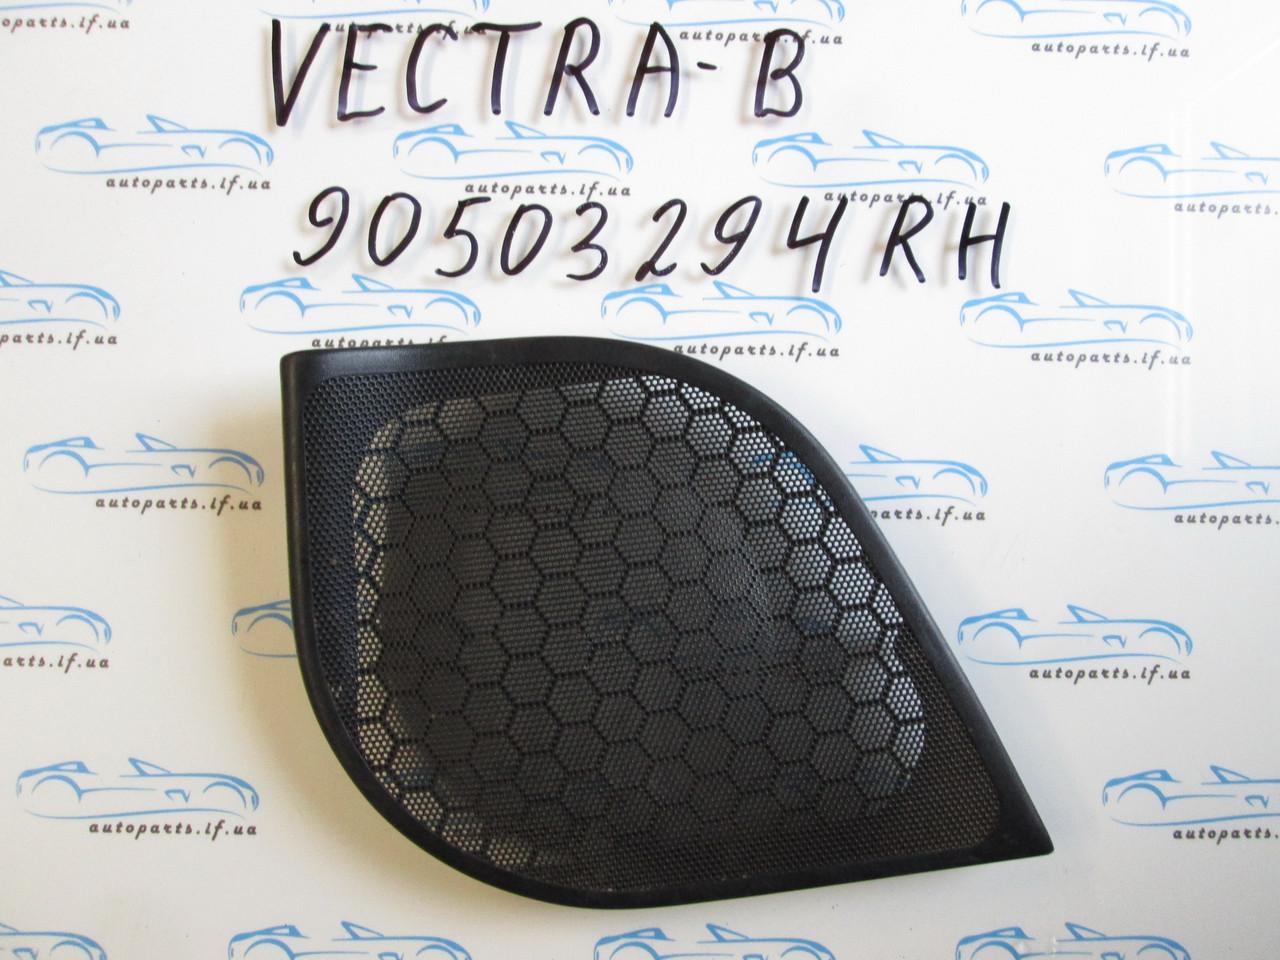 Накладка динамика Вектра Б, opel Vectra B 90503294 правая зад